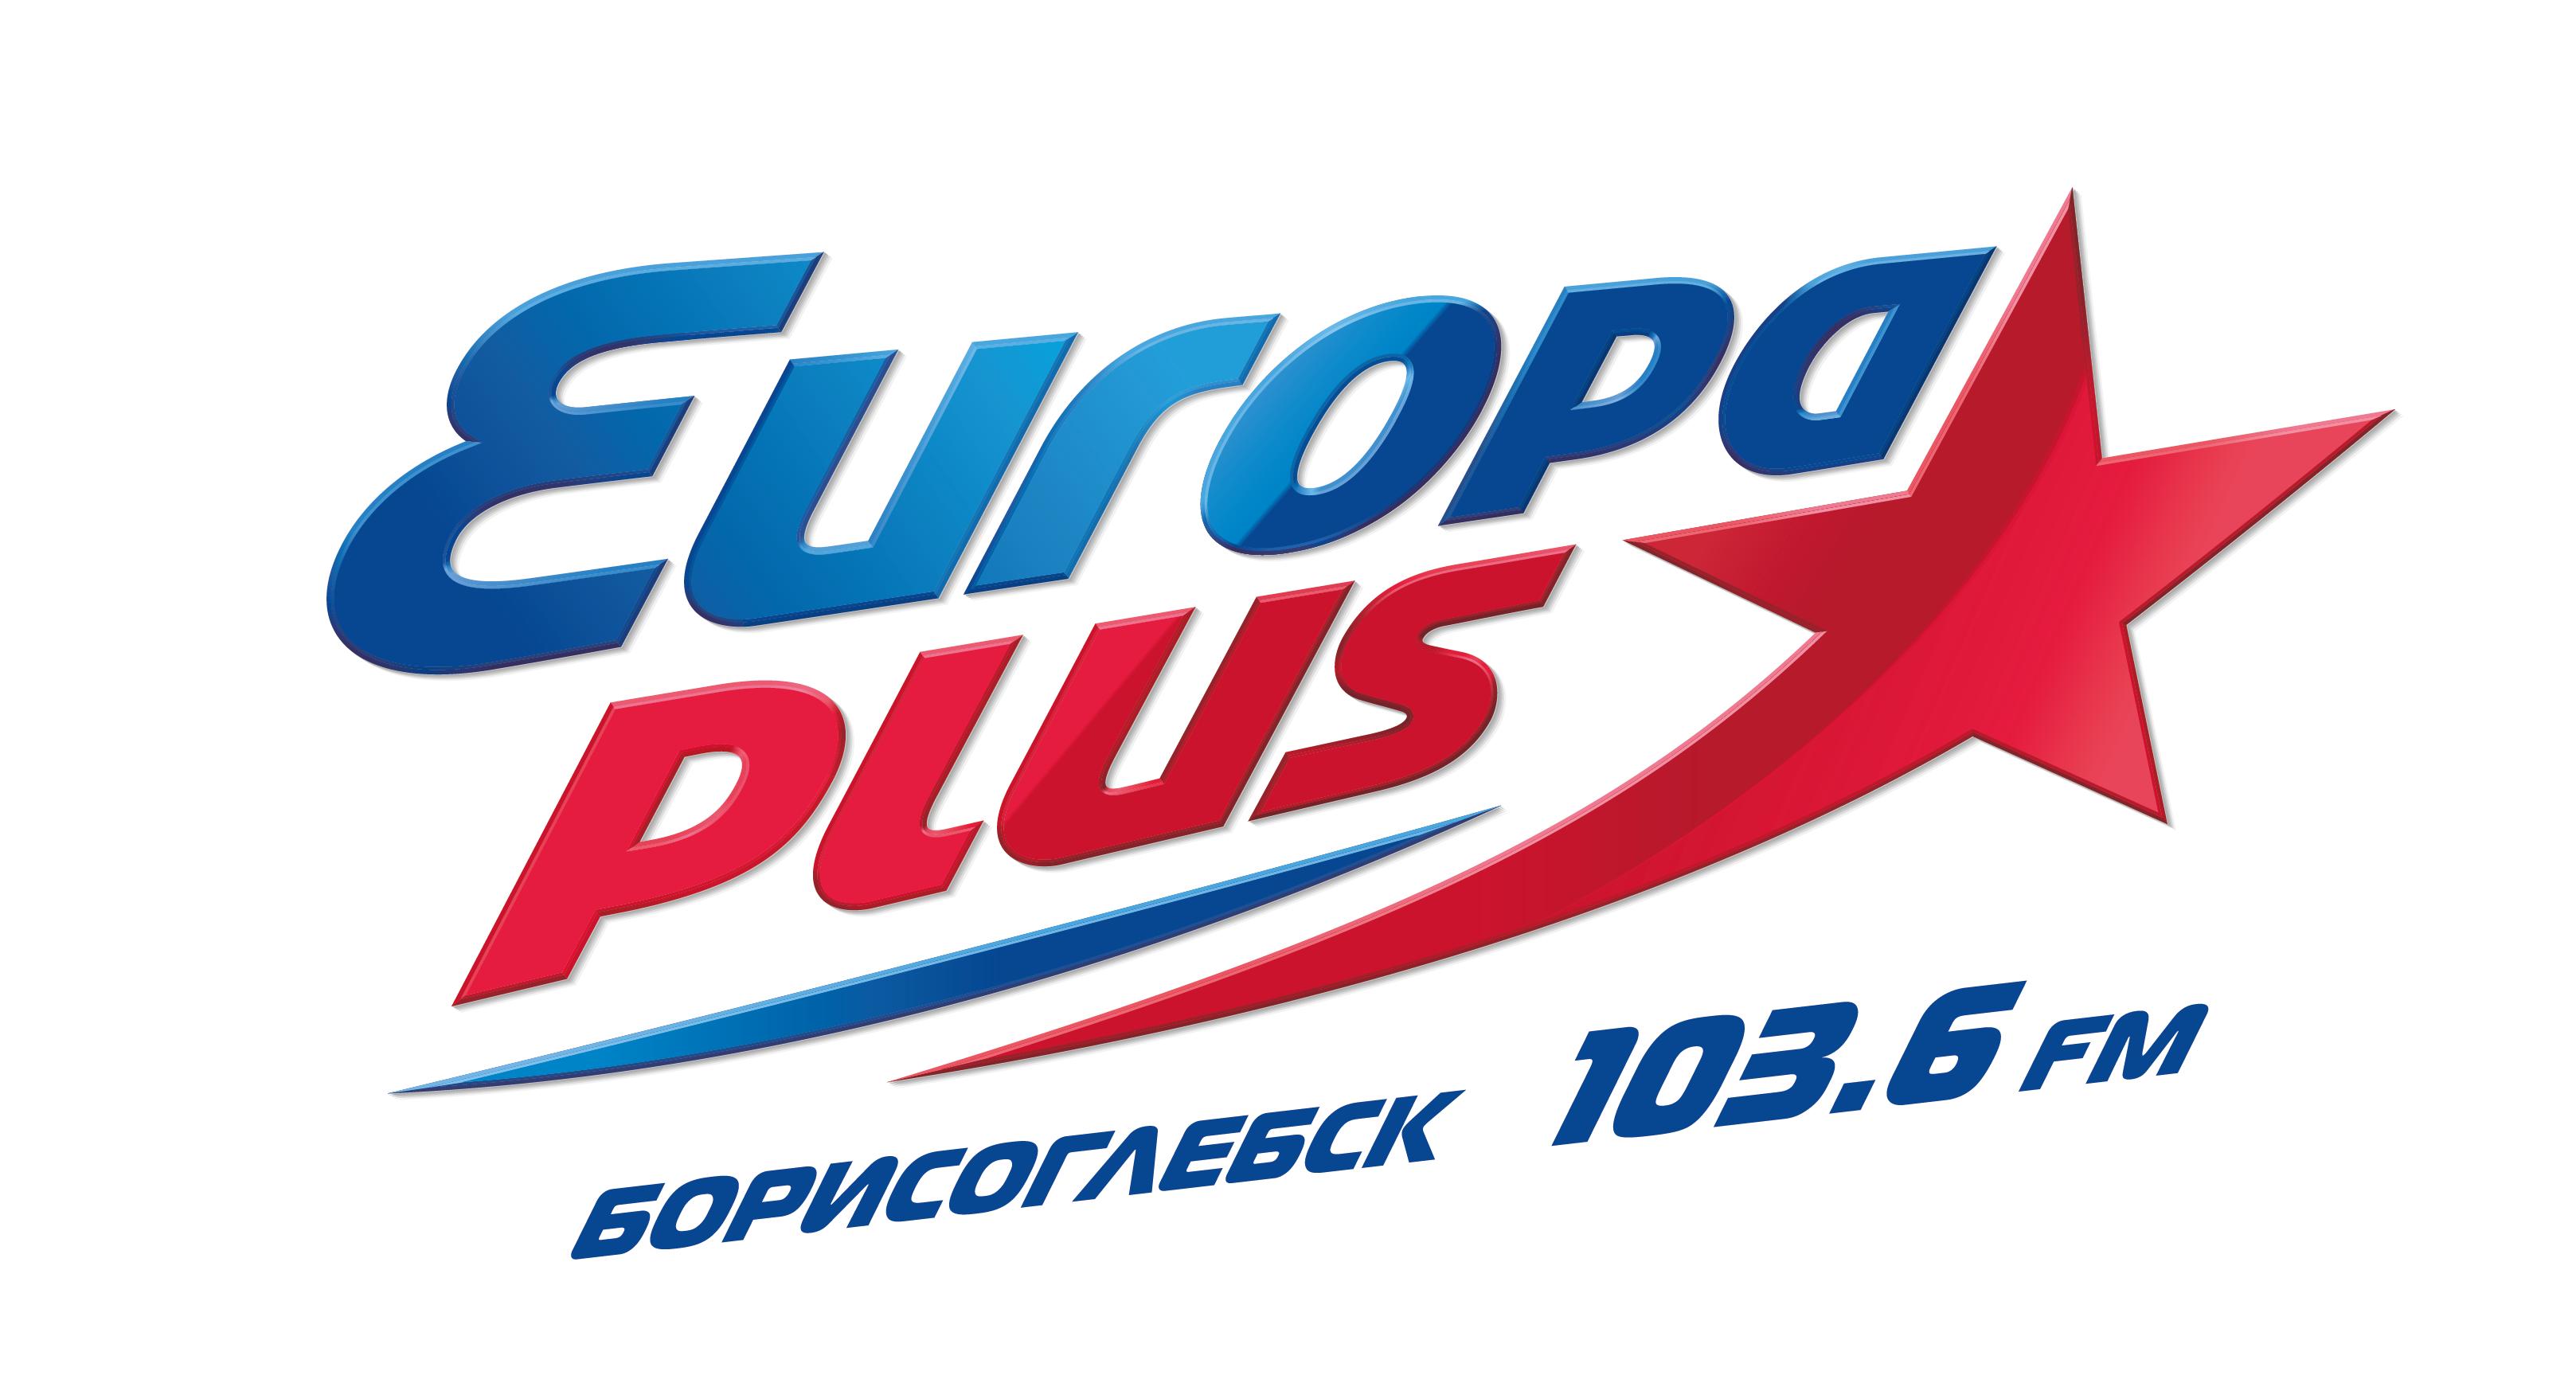 Цены Европа Плюс Борисоглебск